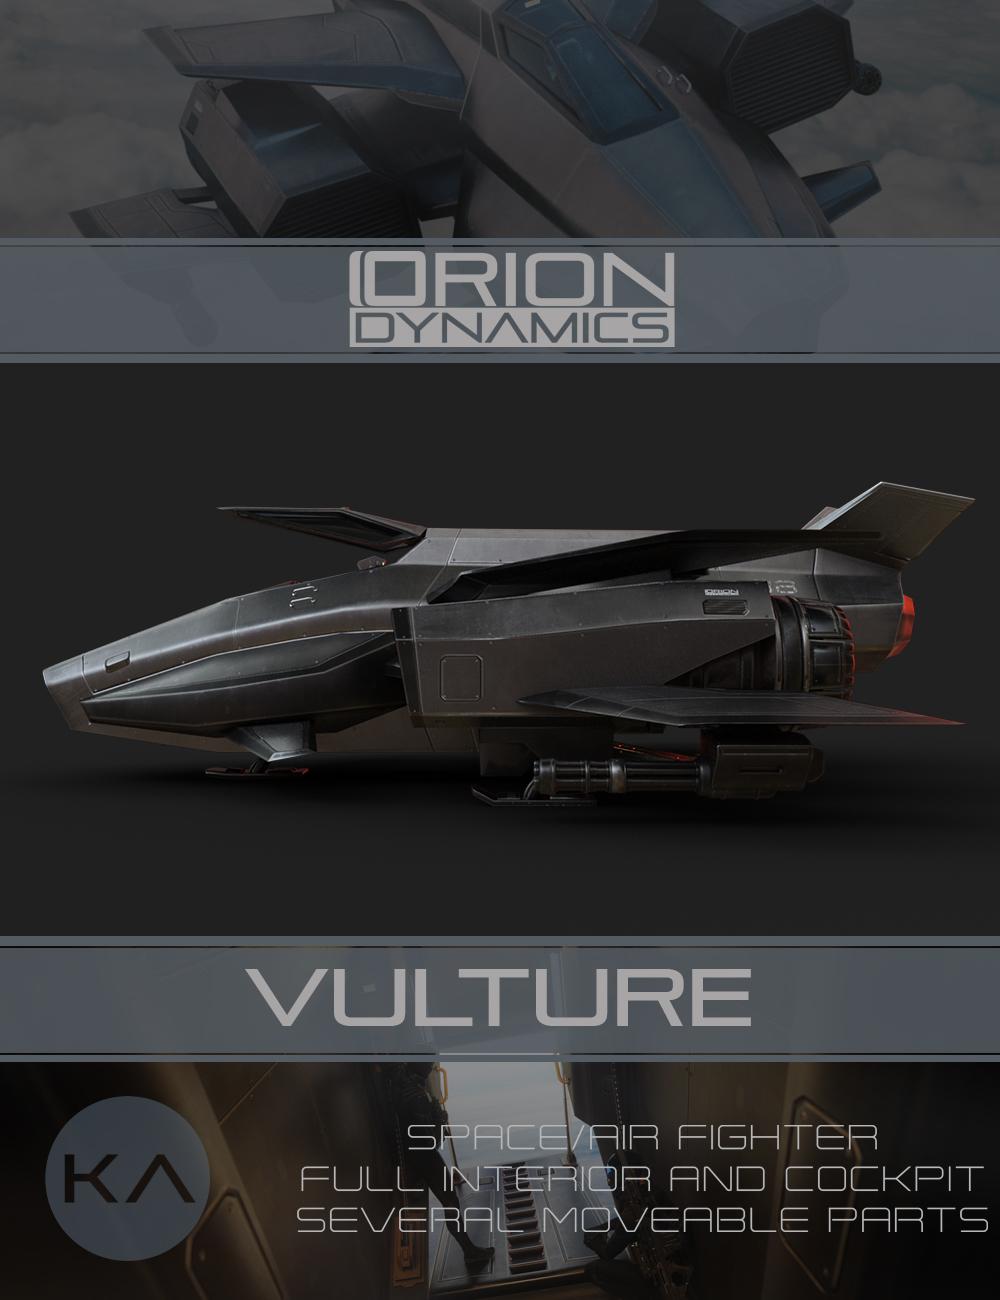 Orion Dynamics: Vulture by: KindredArts, 3D Models by Daz 3D